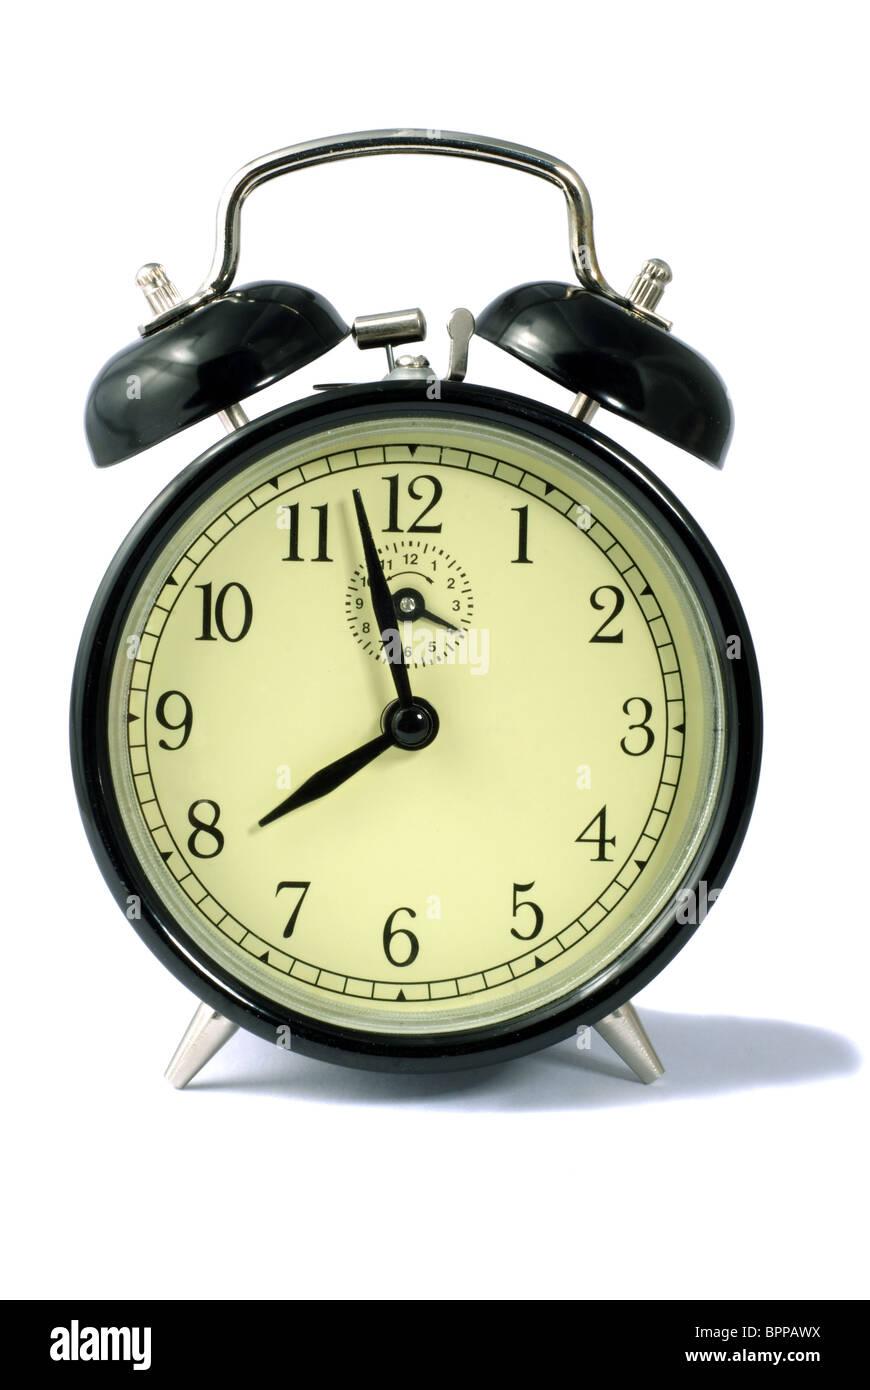 Vintage Style Old Black Clockwork Alarm Clock With Bells Stock Photo